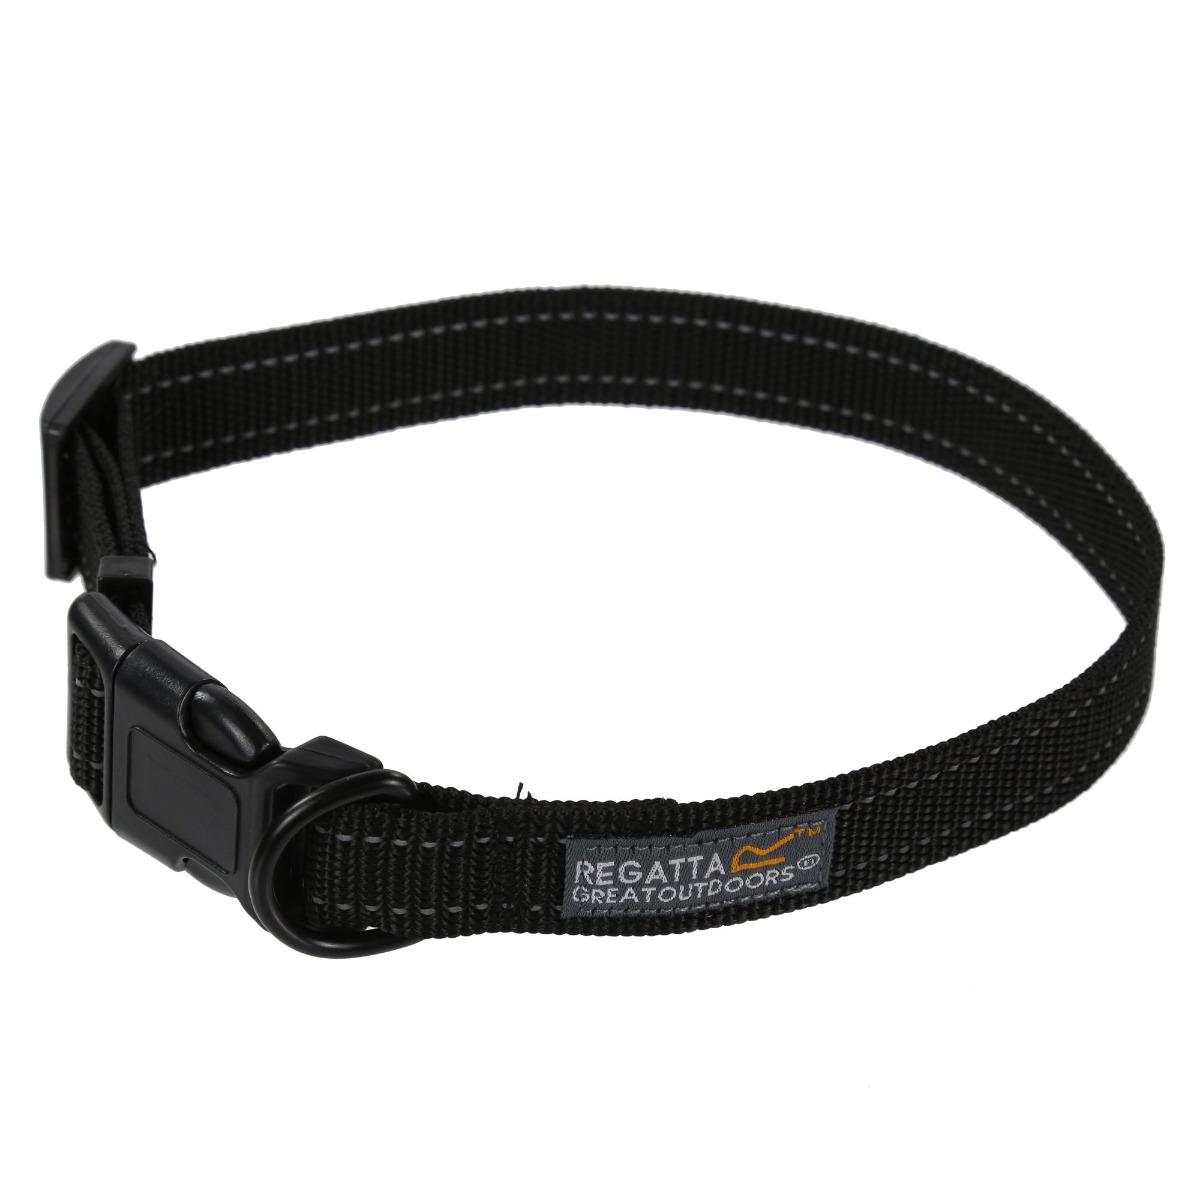 Regatta Comfort Dog Collar - Black - 45 - 70